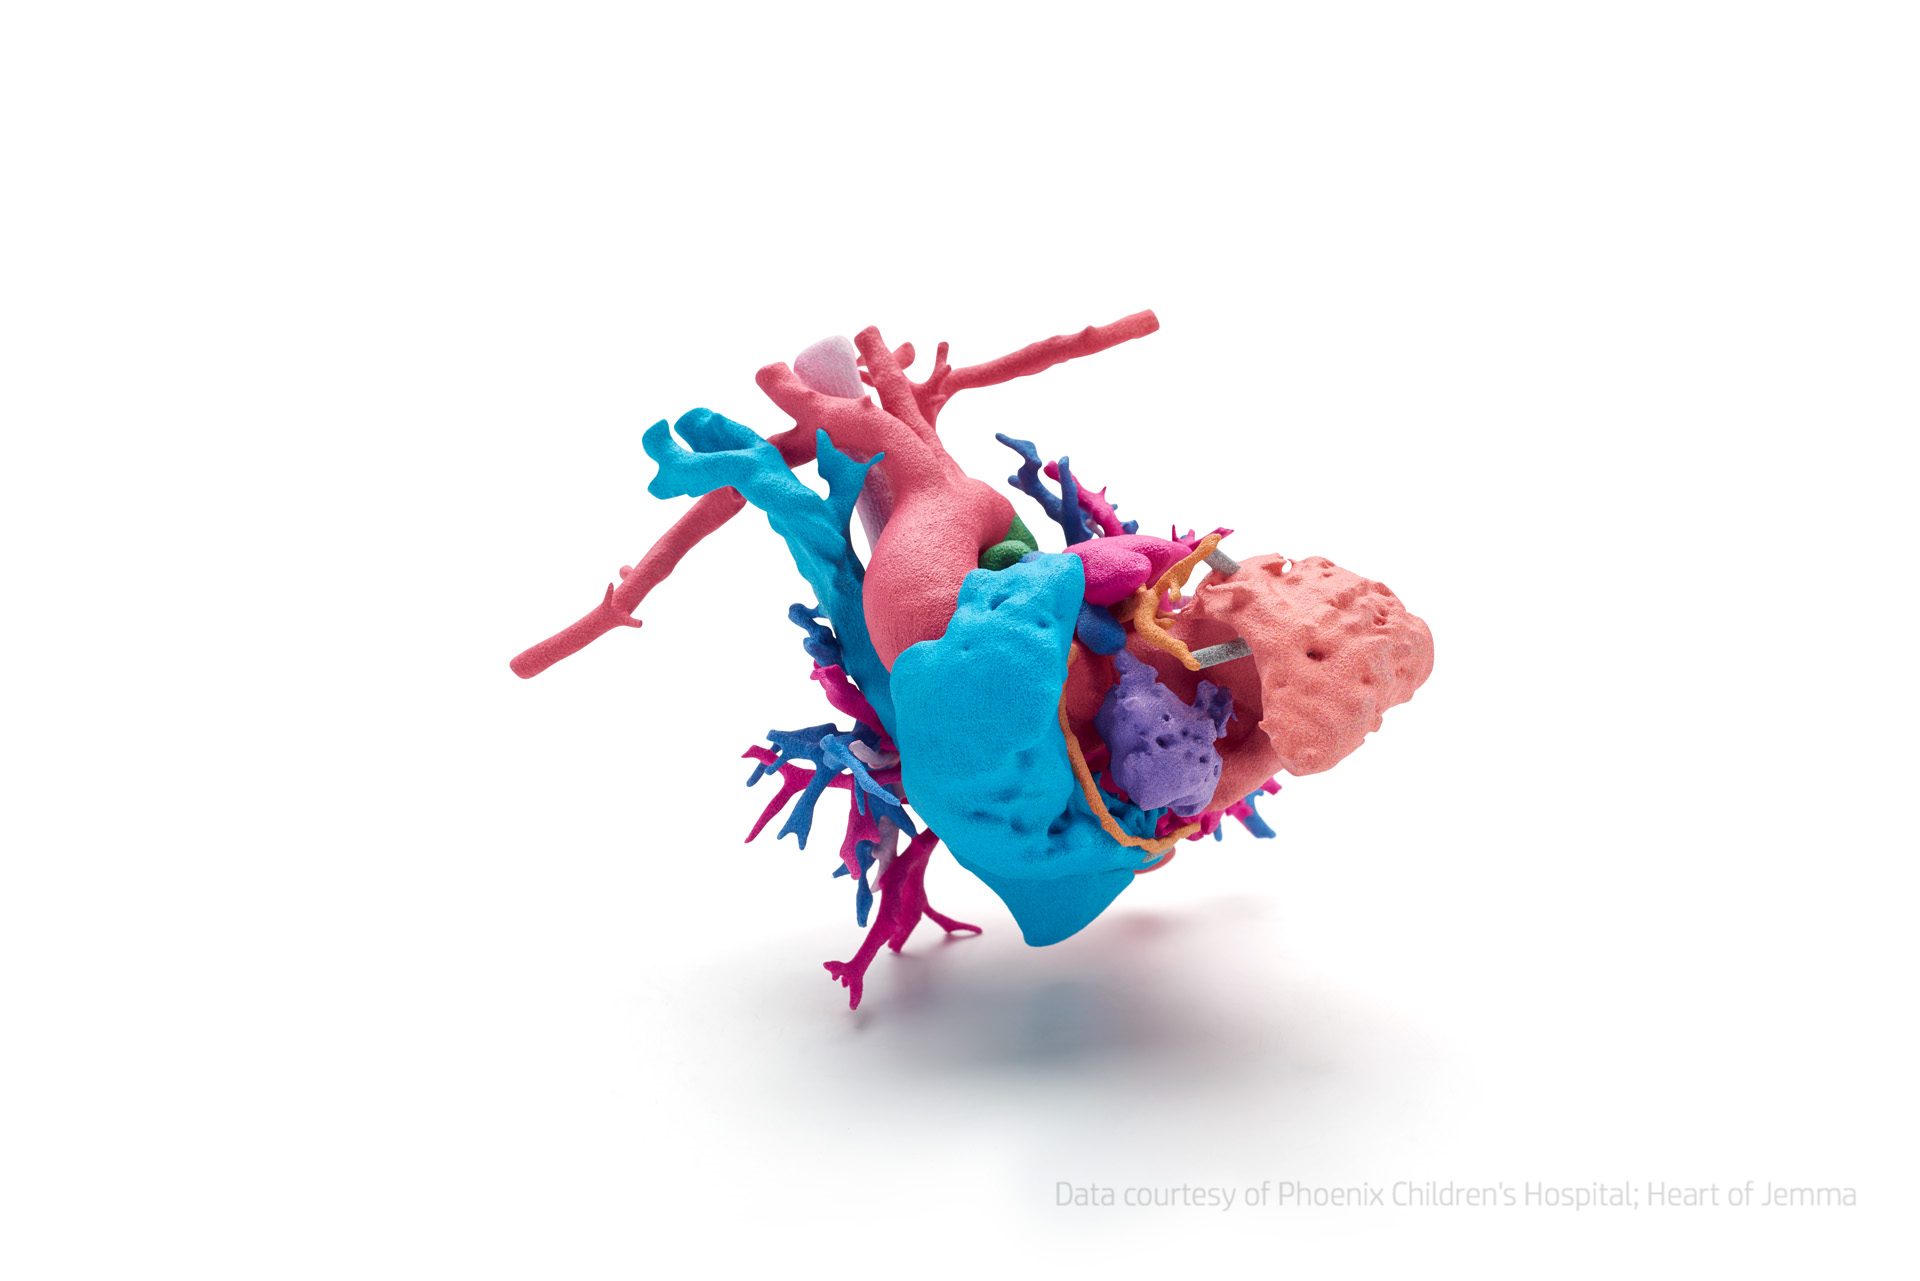 3D Printed Full Color Heart HP Jet Fusion 3d drucker - HP stellt 3D-Farbdrucker vor: Jet Fusion 300 und 500 Serie